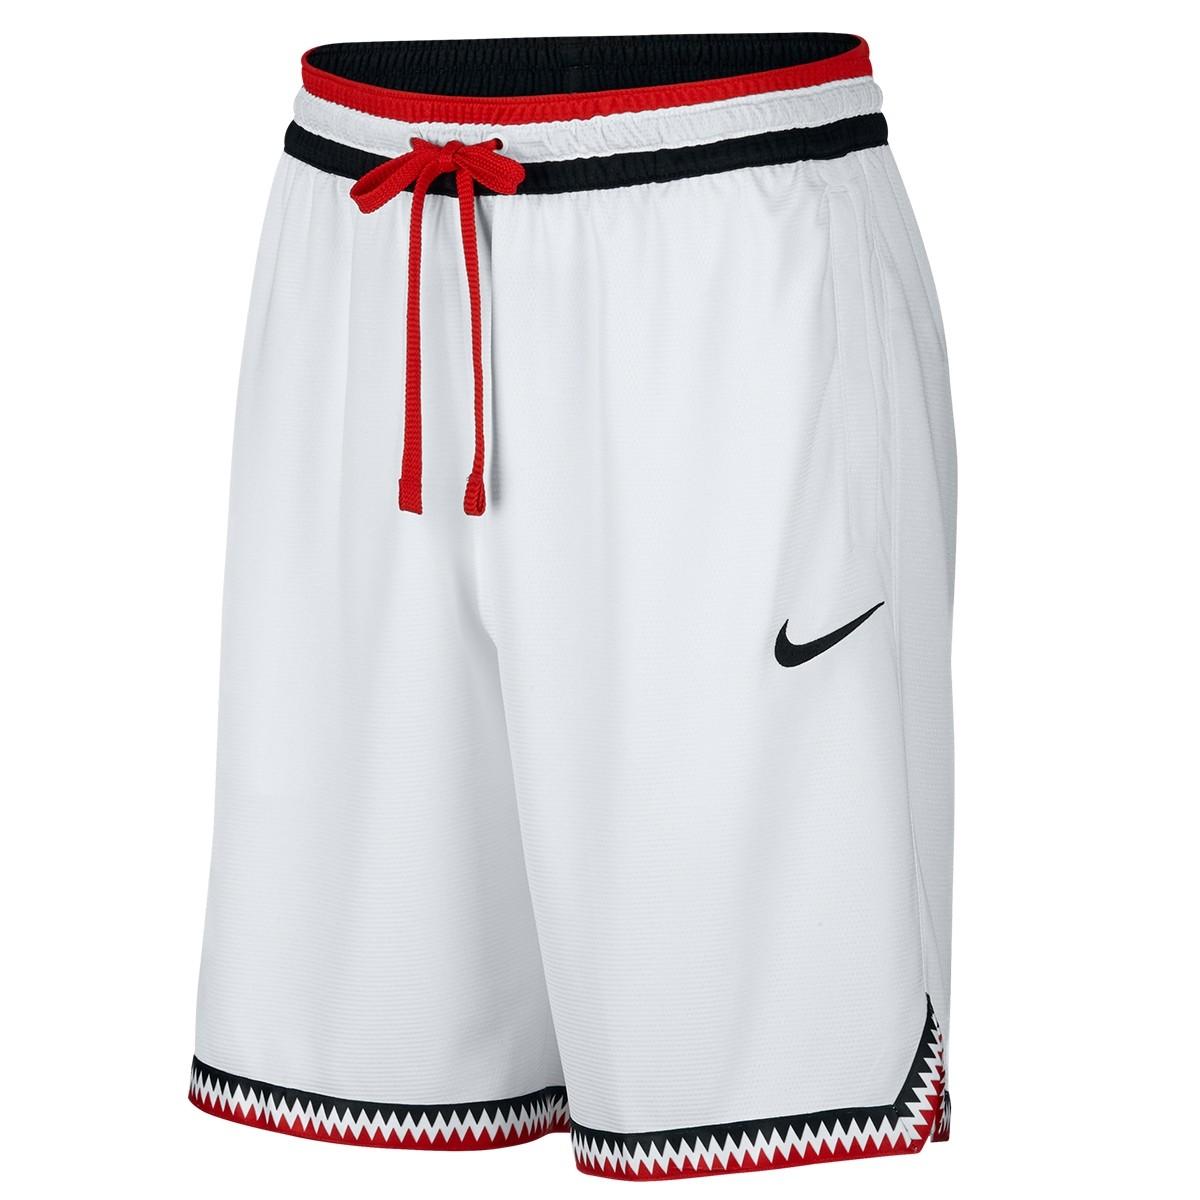 Nike DRI-FIT DNA 'White'